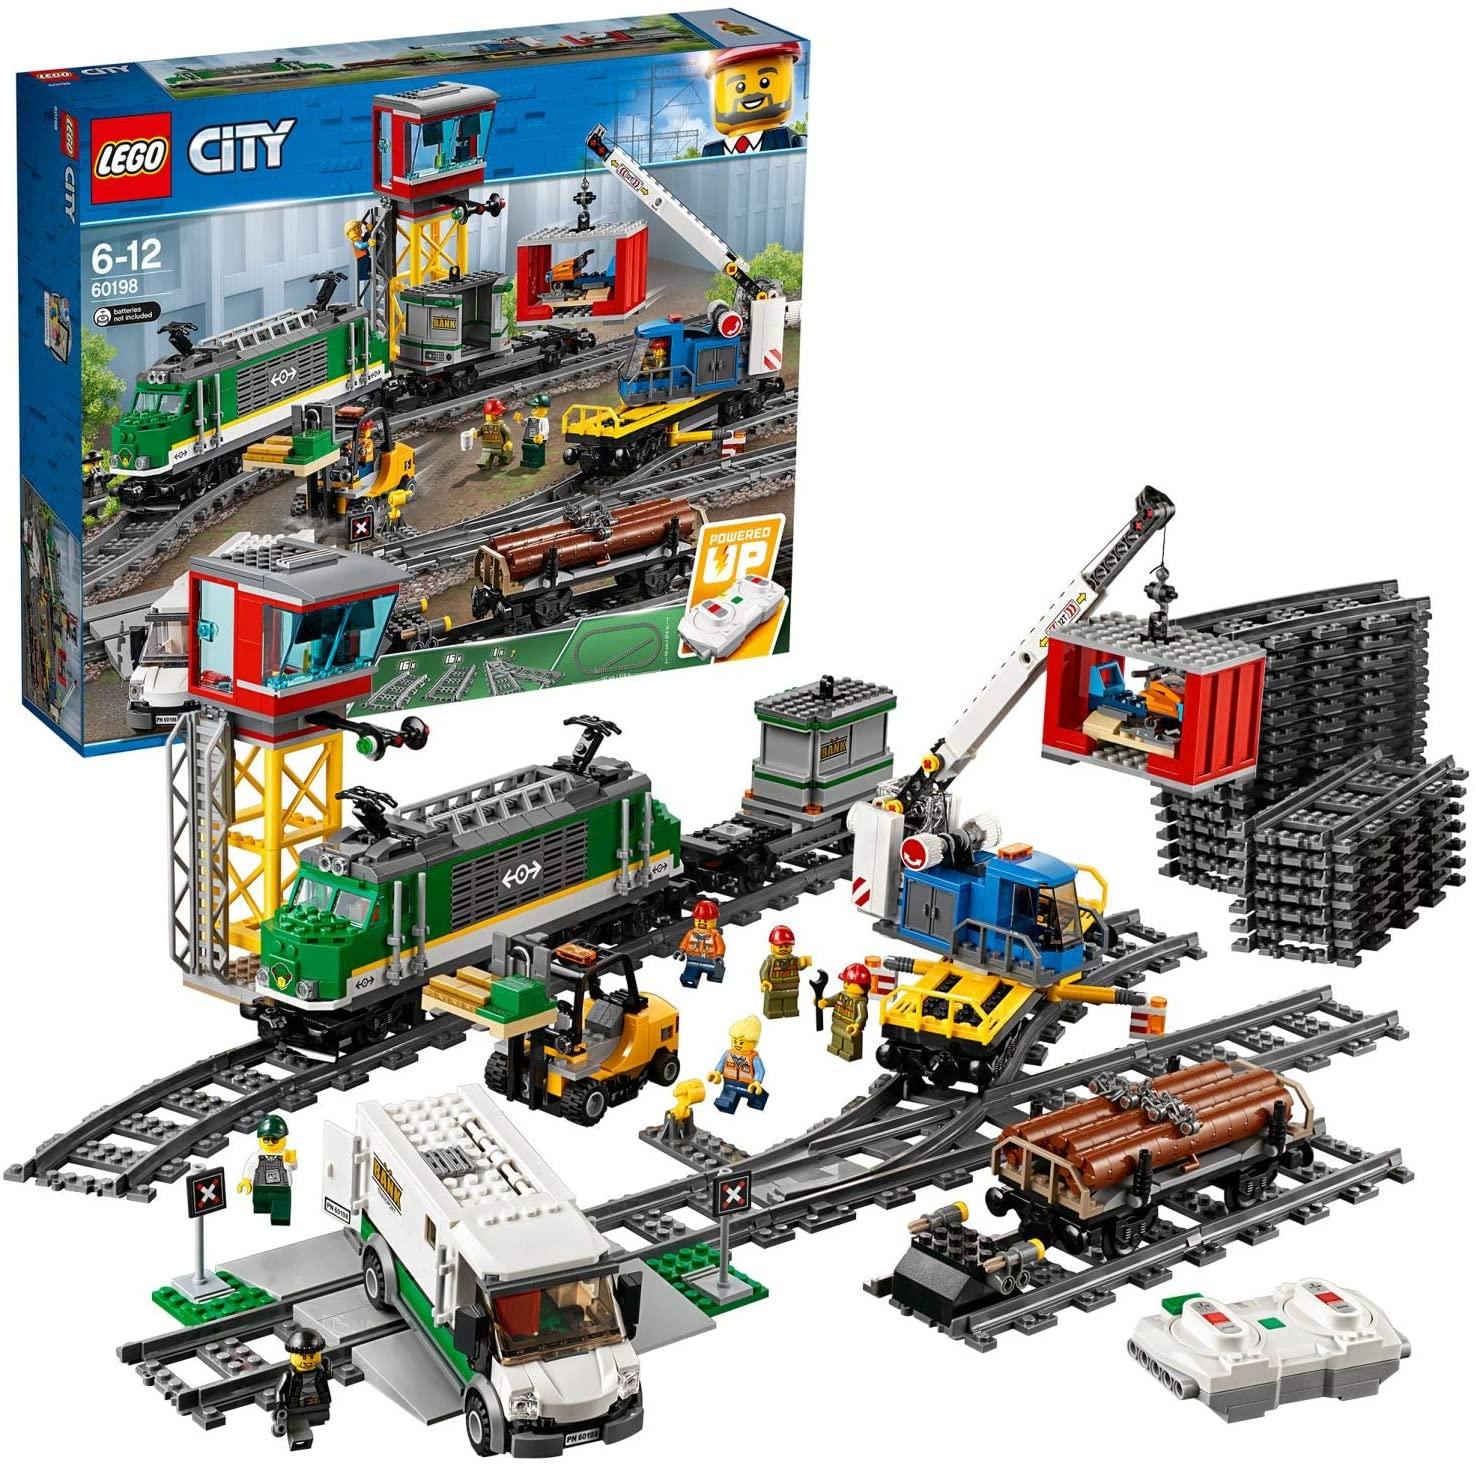 LEGO 60198 City Trains Cargo Train